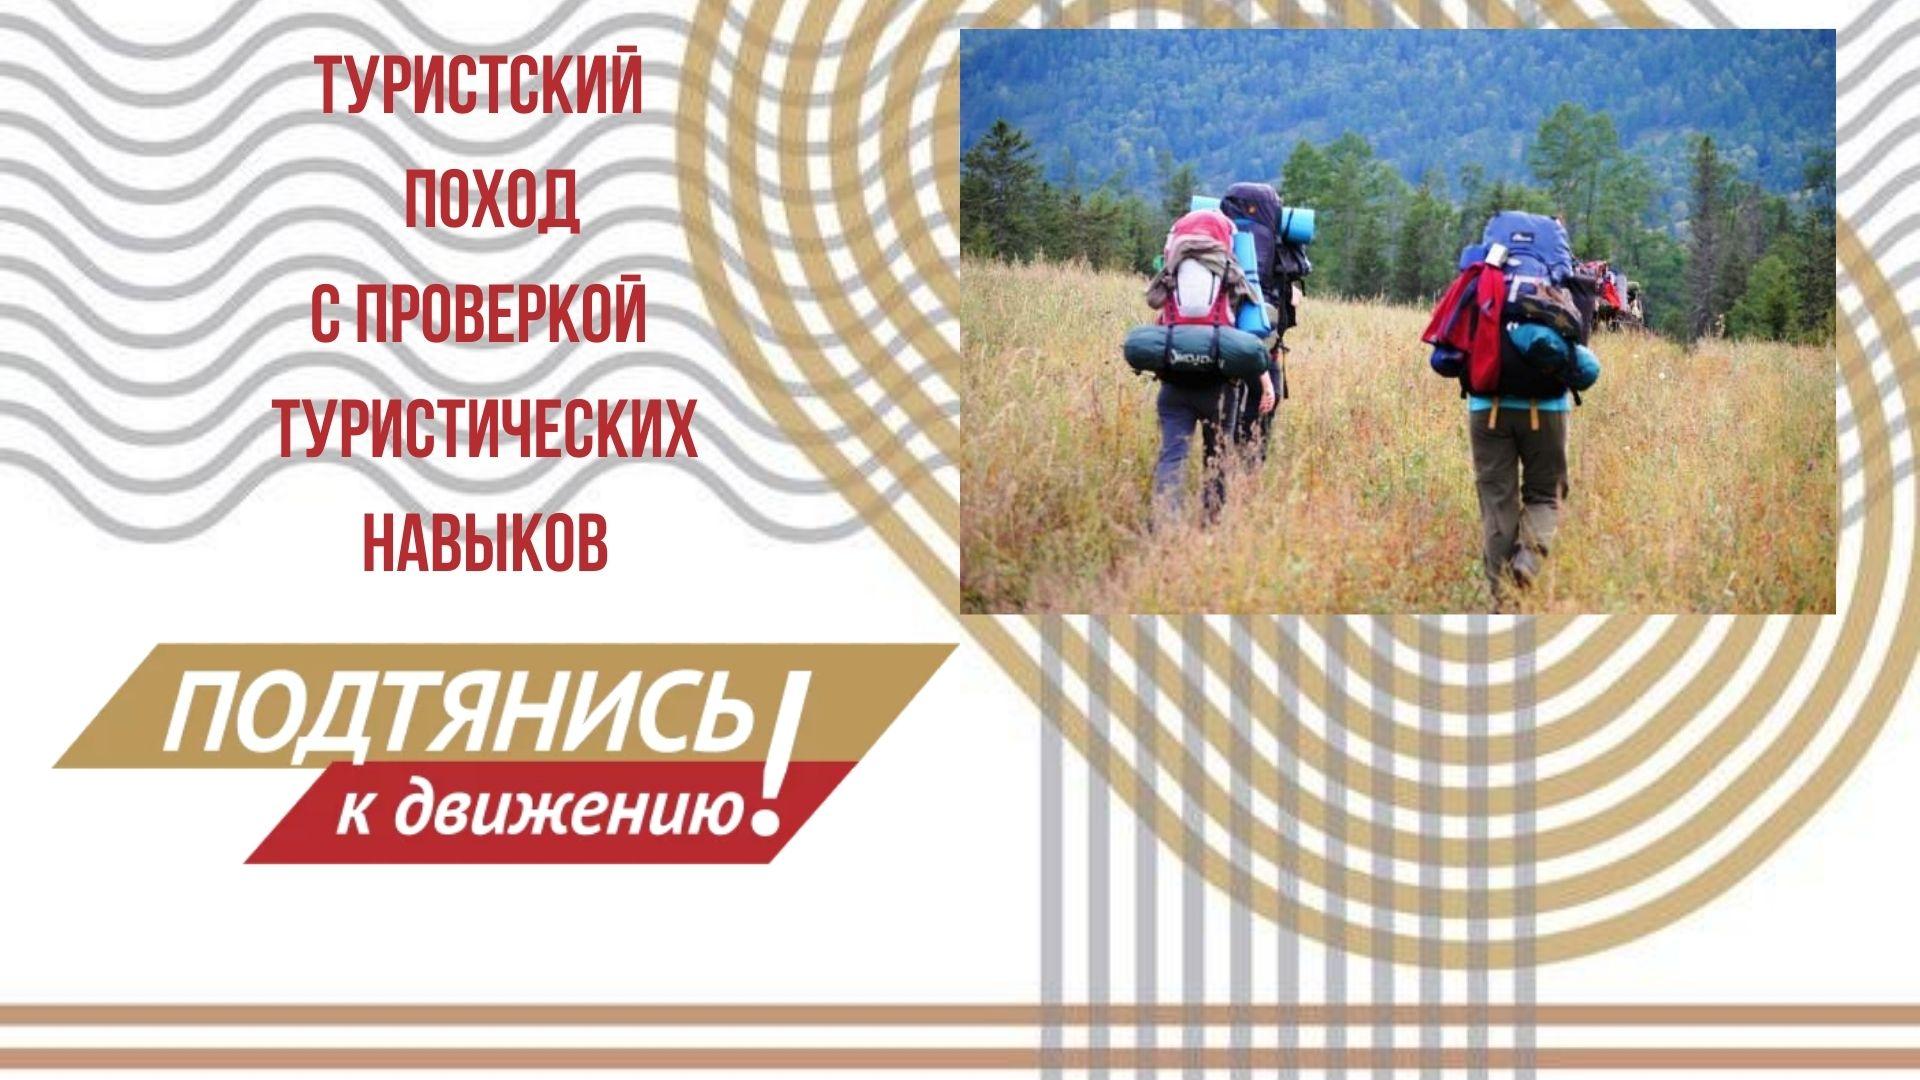 Туристский поход. Часть 2